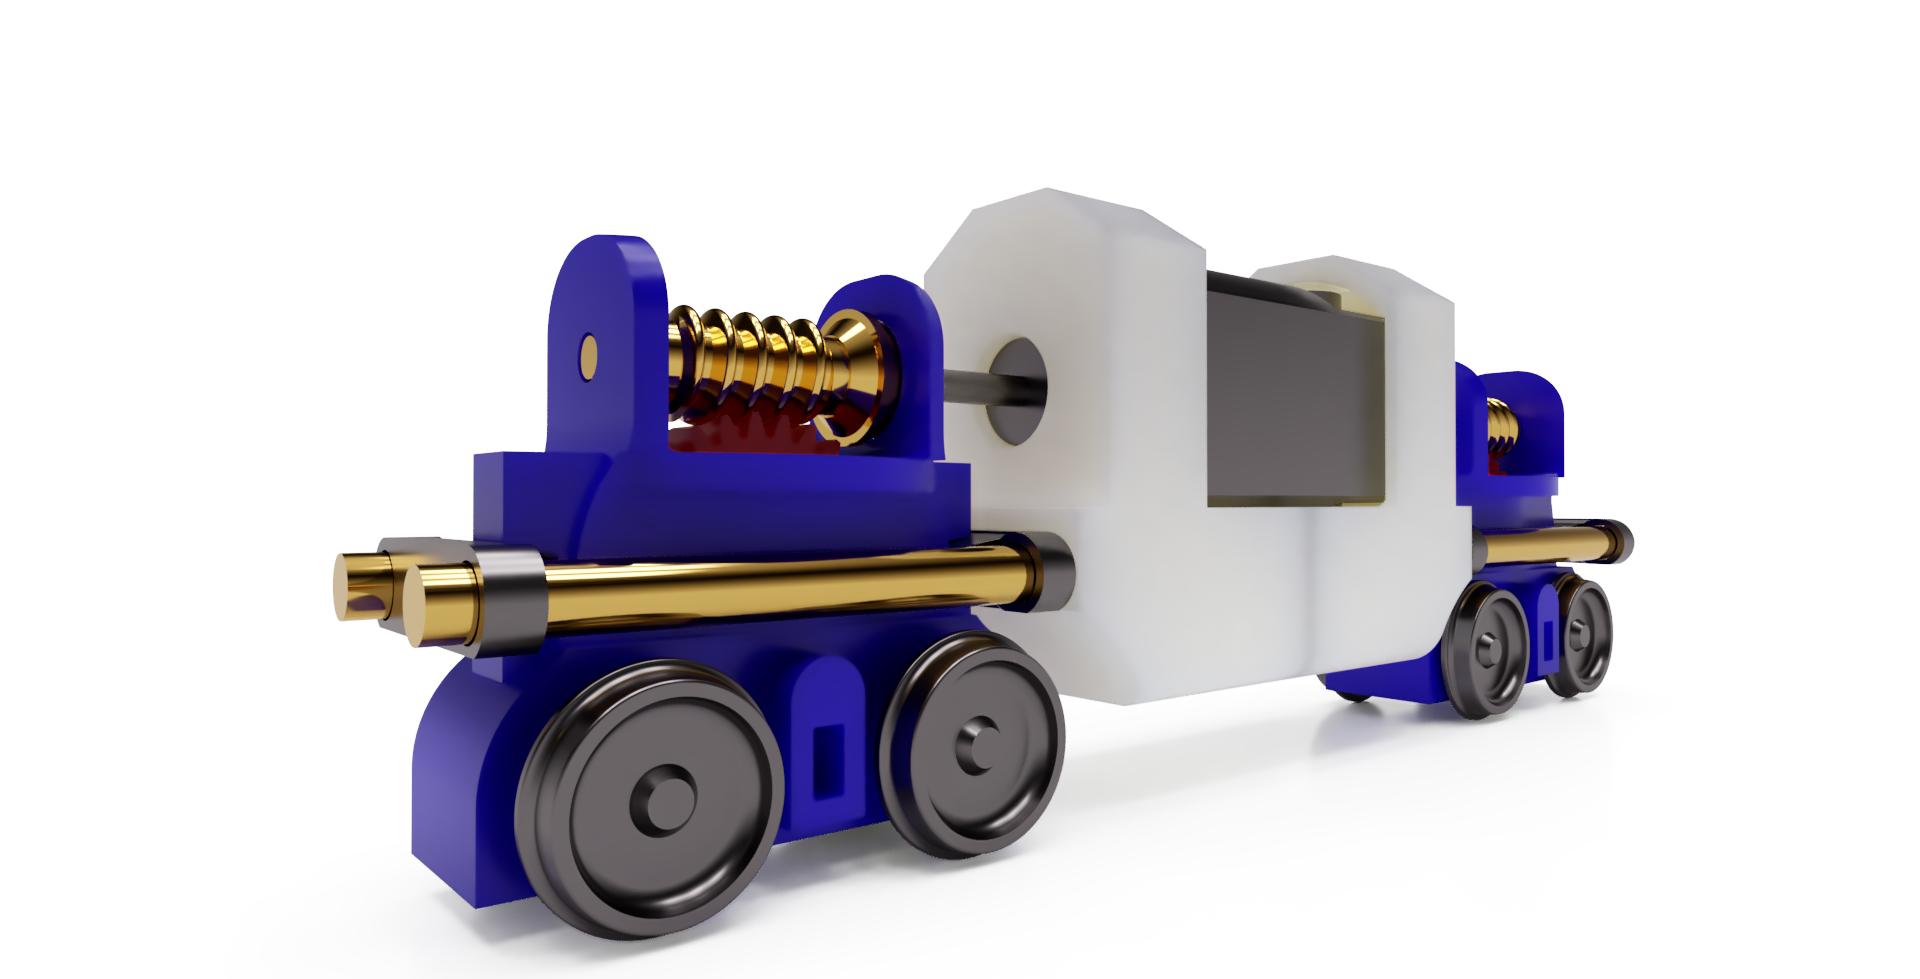 Uni-Rail Powered Chassis – J Kelly Craft & Trade